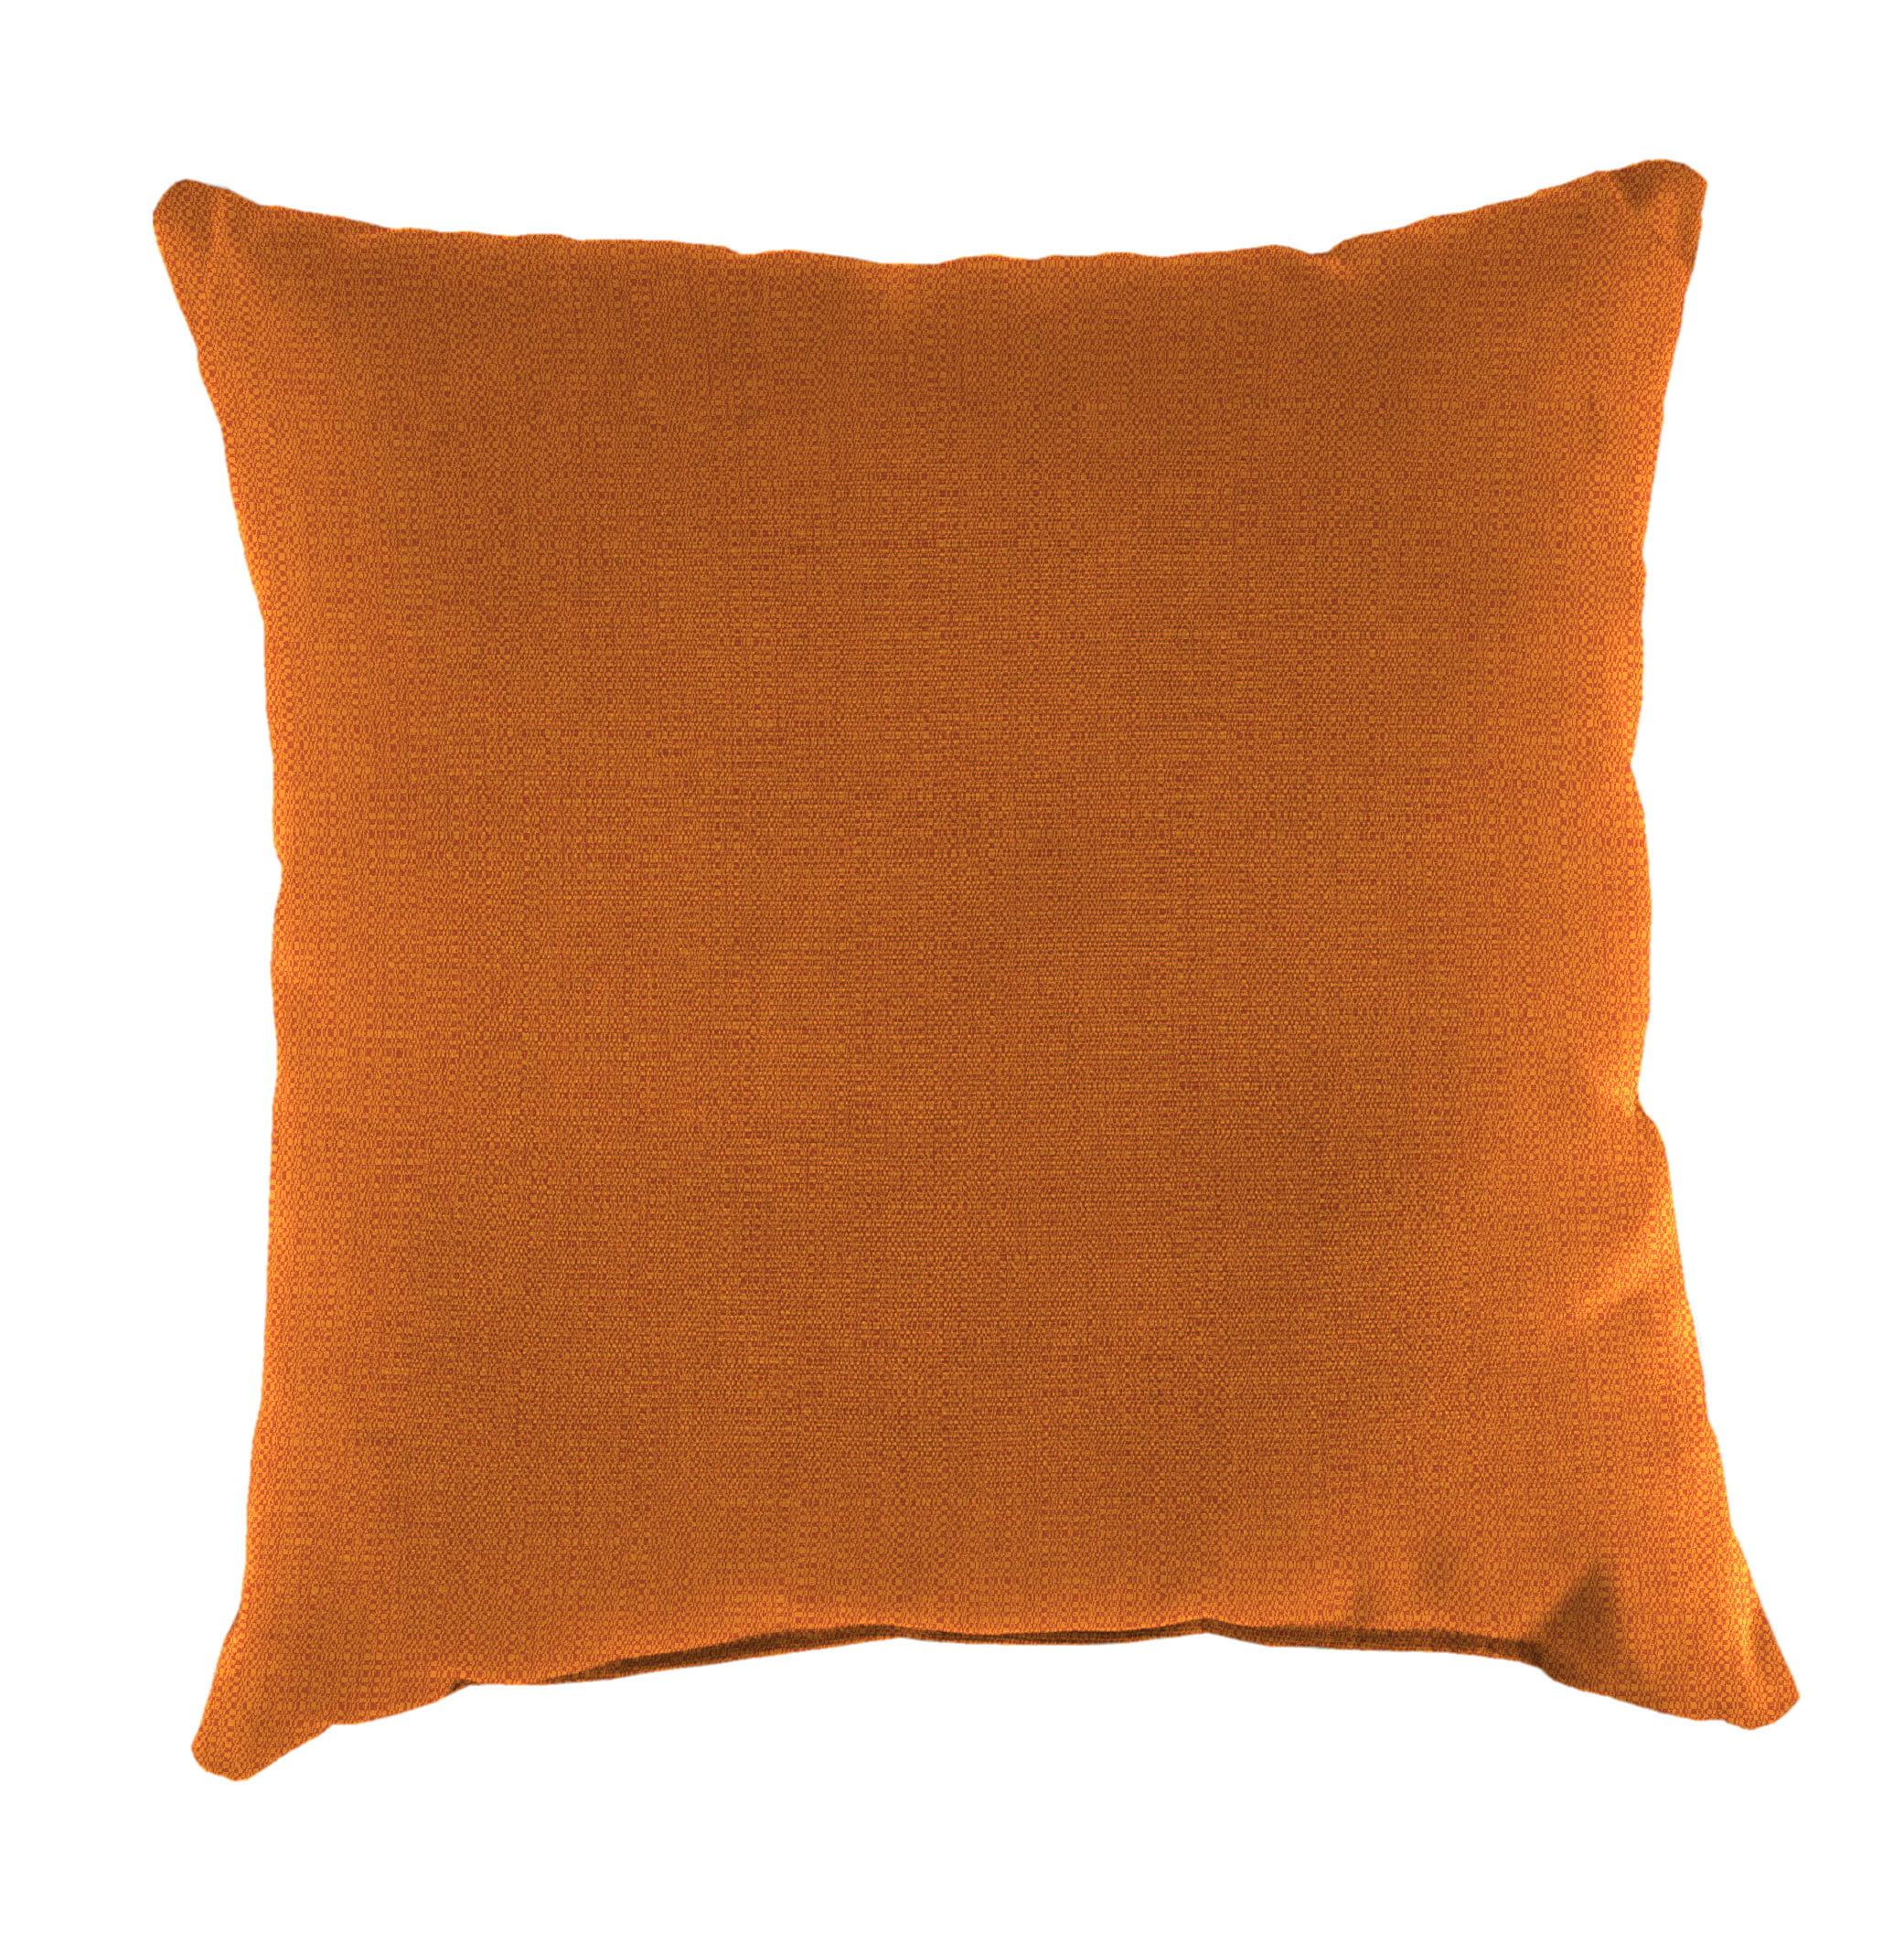 Mainstays Maindstays Solid Orange Pillow